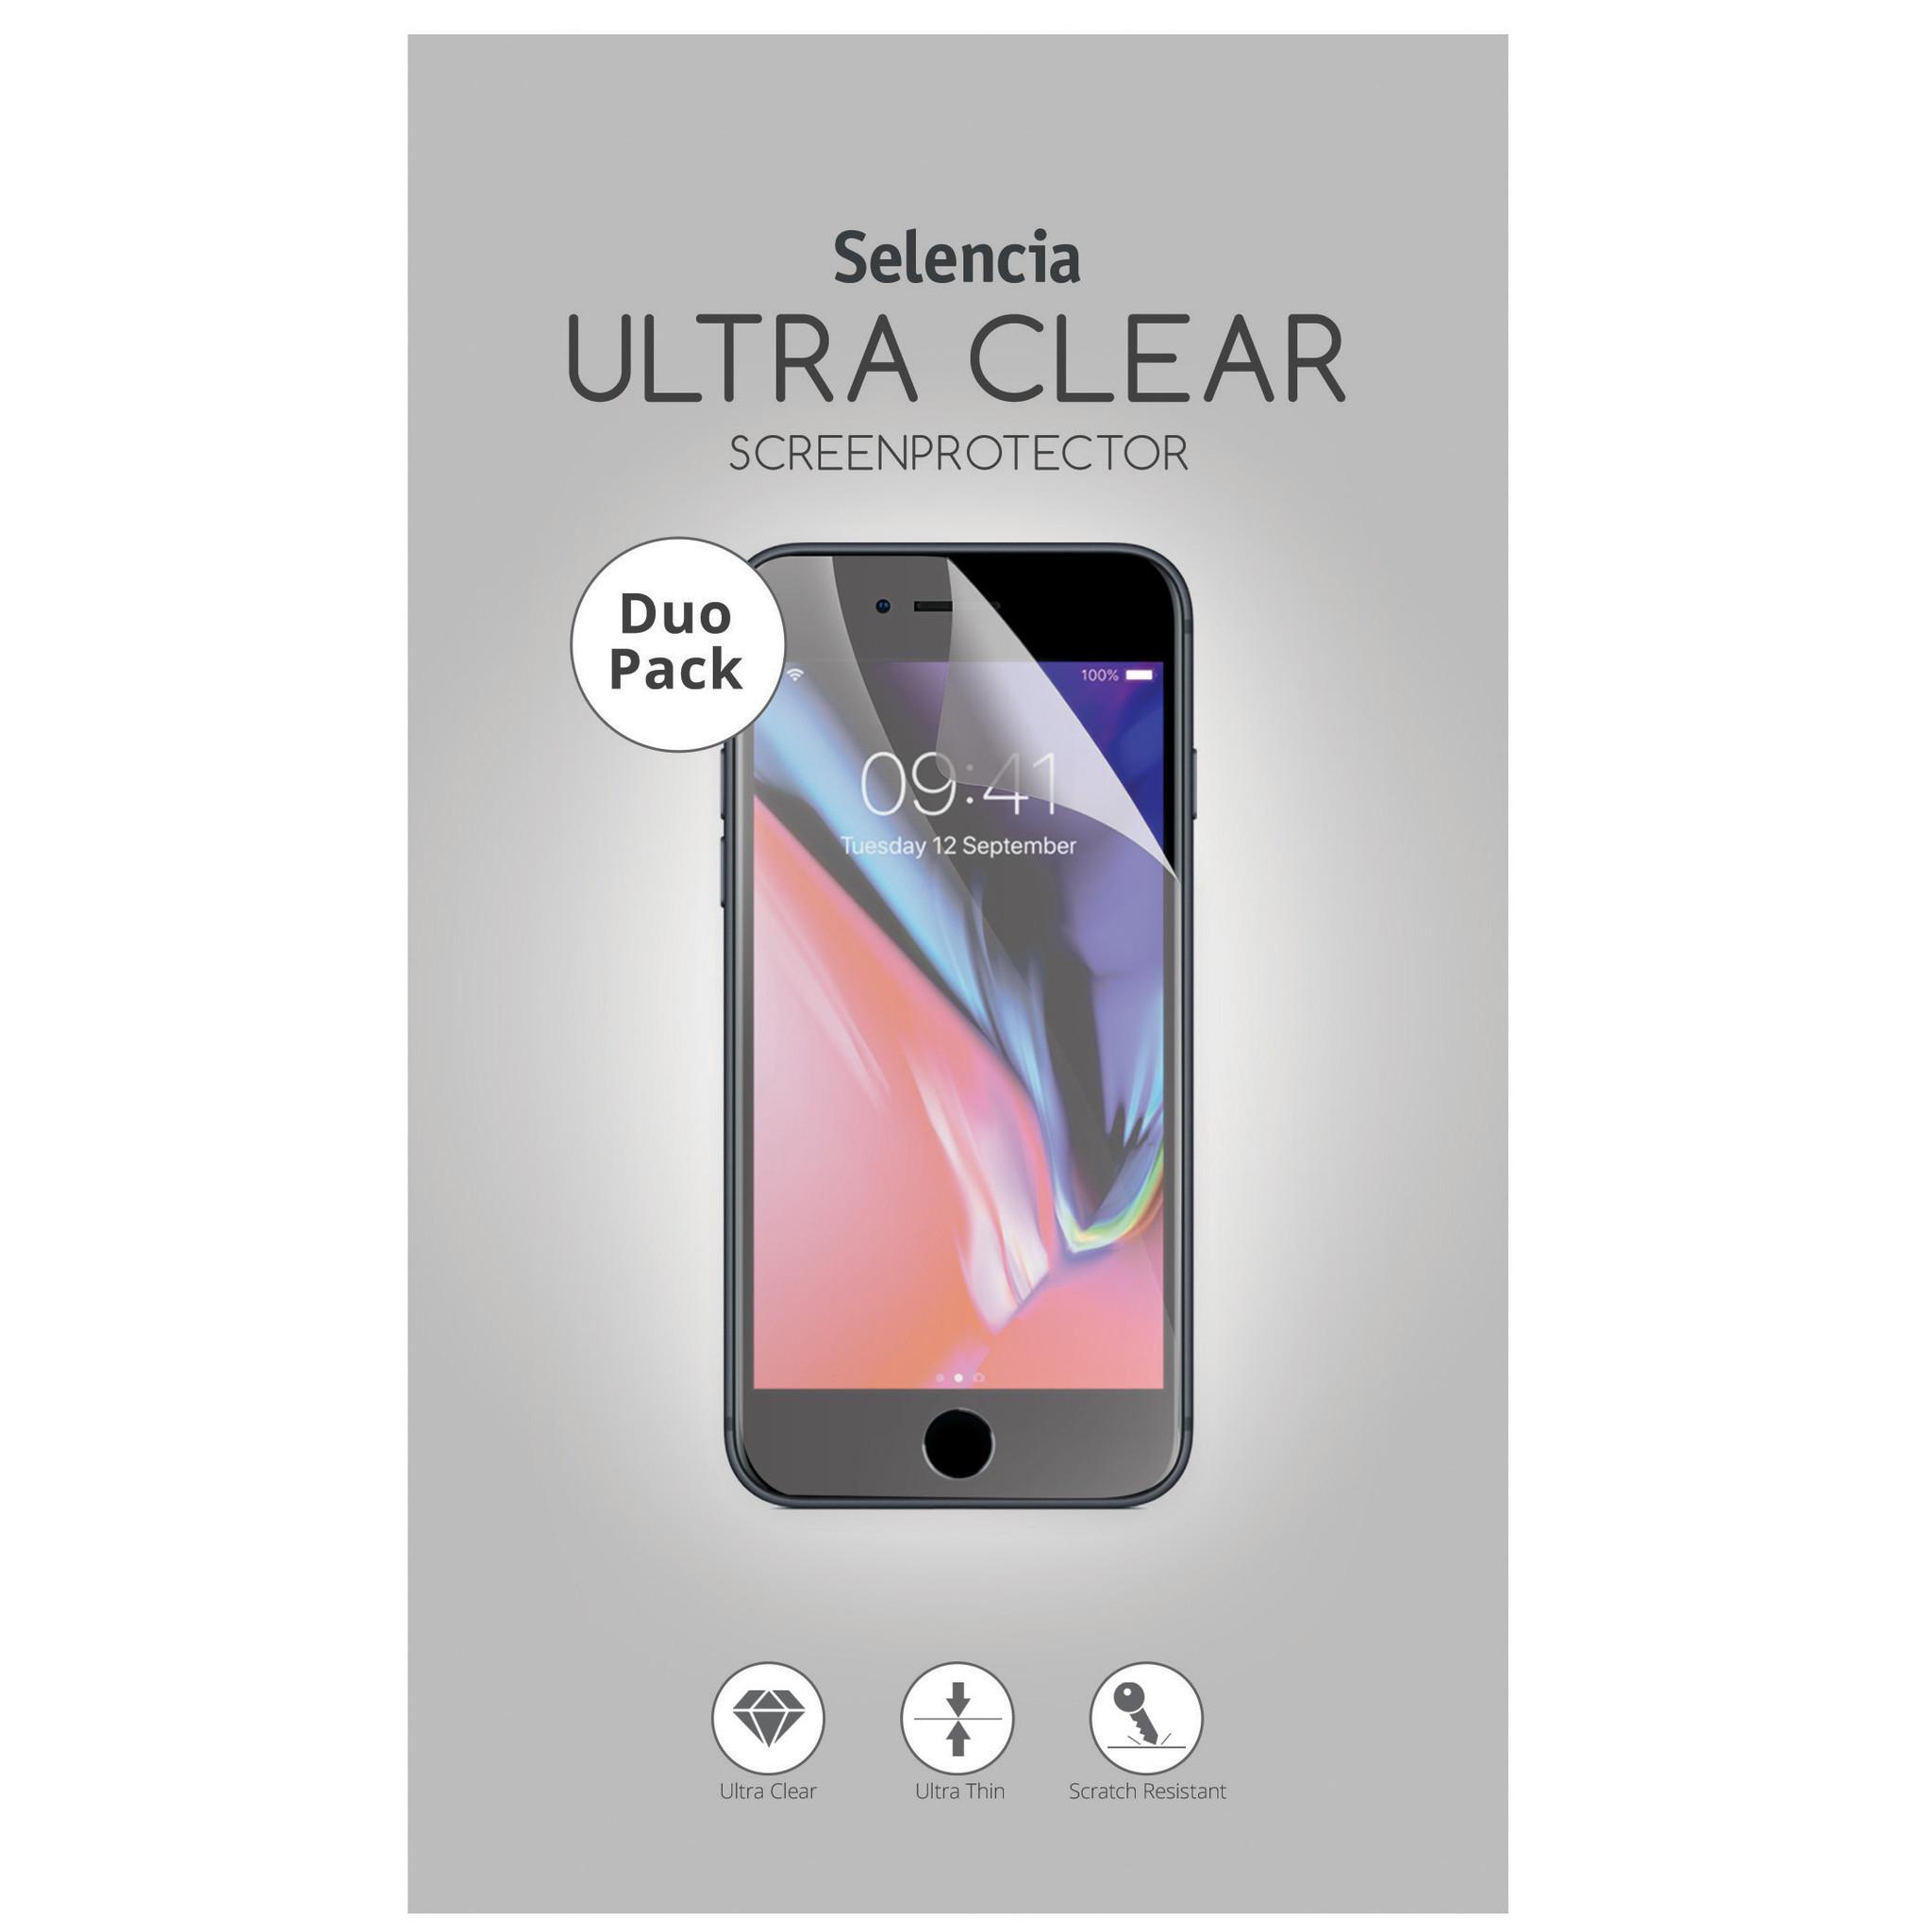 Selencia Duo Pack Ultra Clear Screenprotector voor de Honor 20 Lite